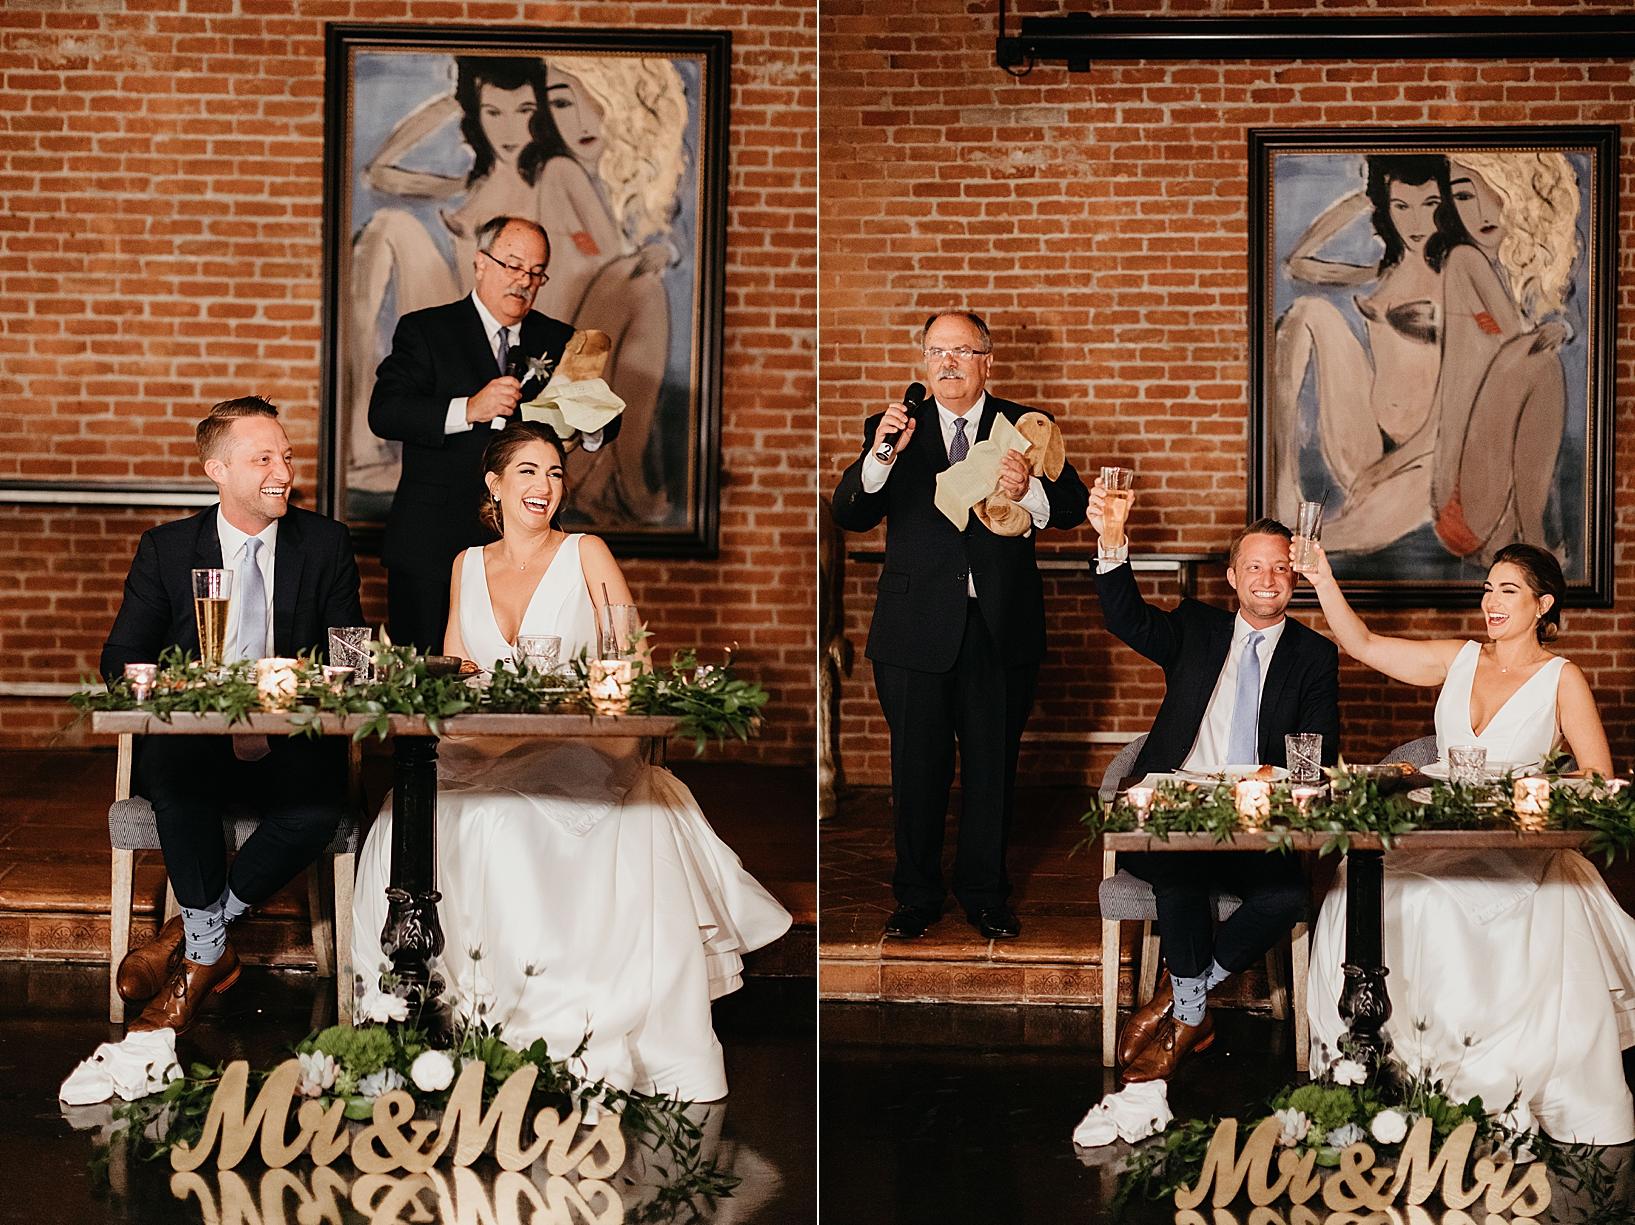 Herb-and-Wood-Wedding-97.jpg